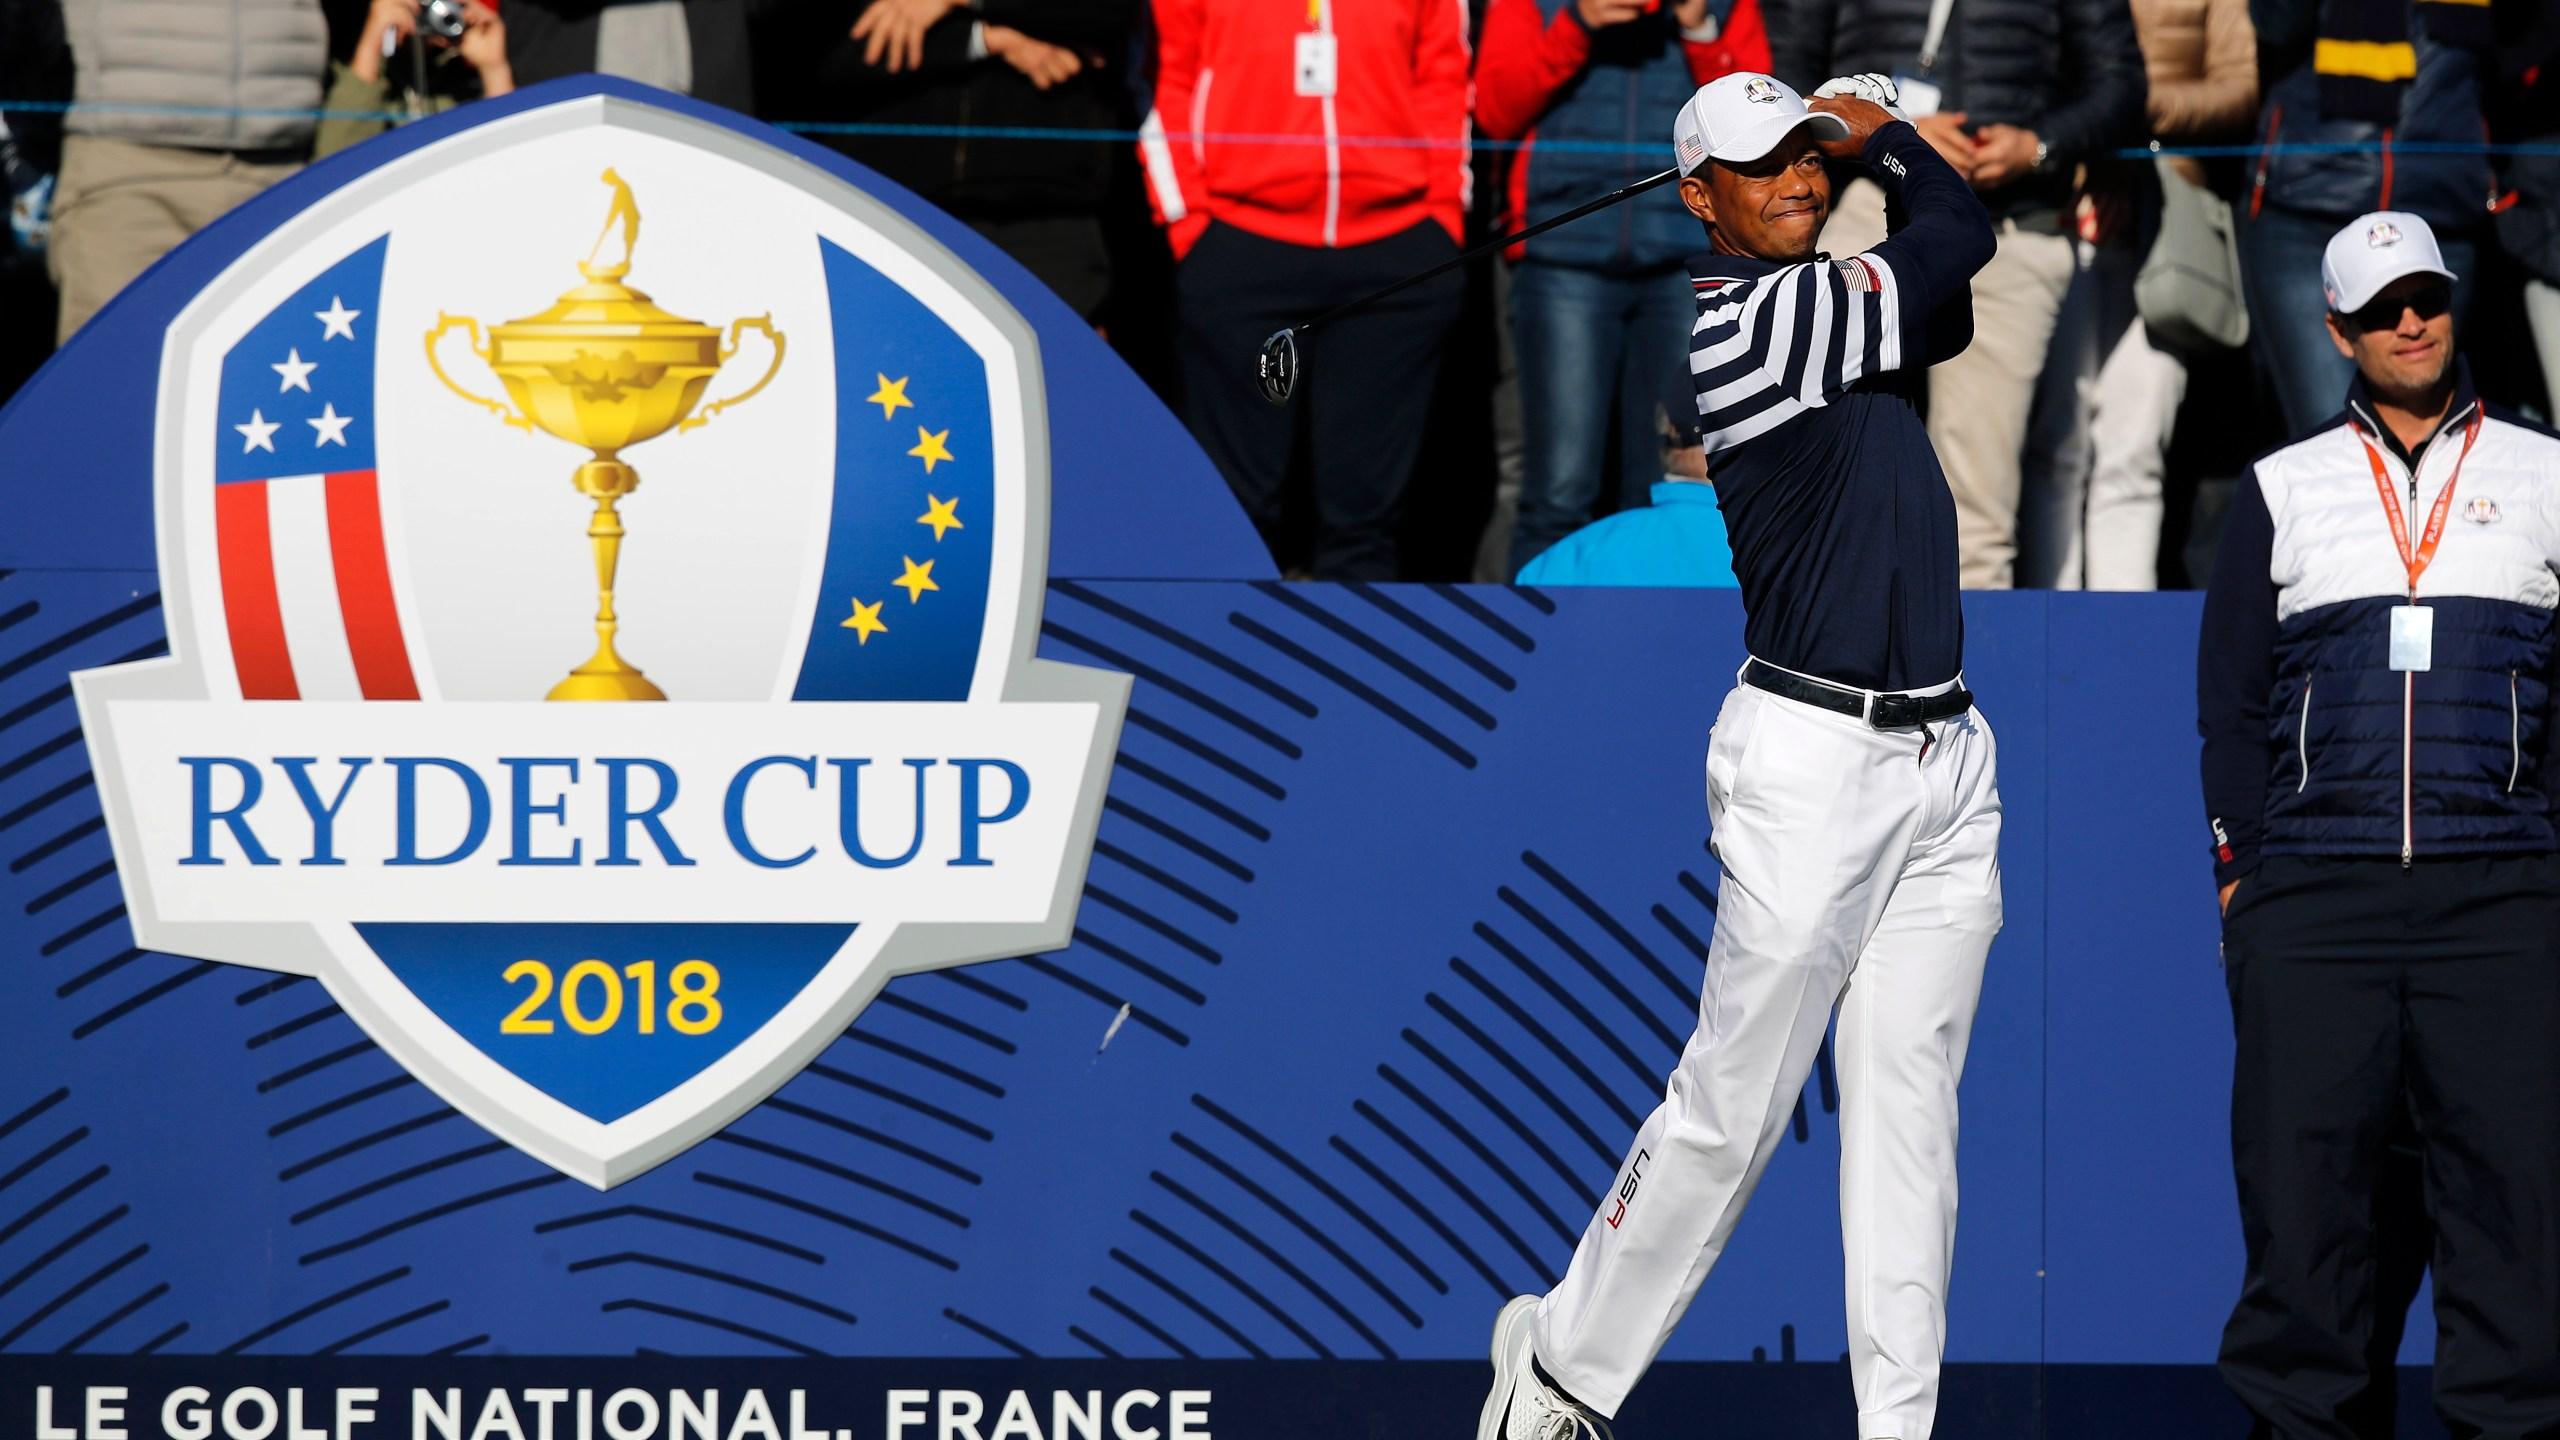 France_Ryder_Cup_Golf_83749-159532.jpg22751192